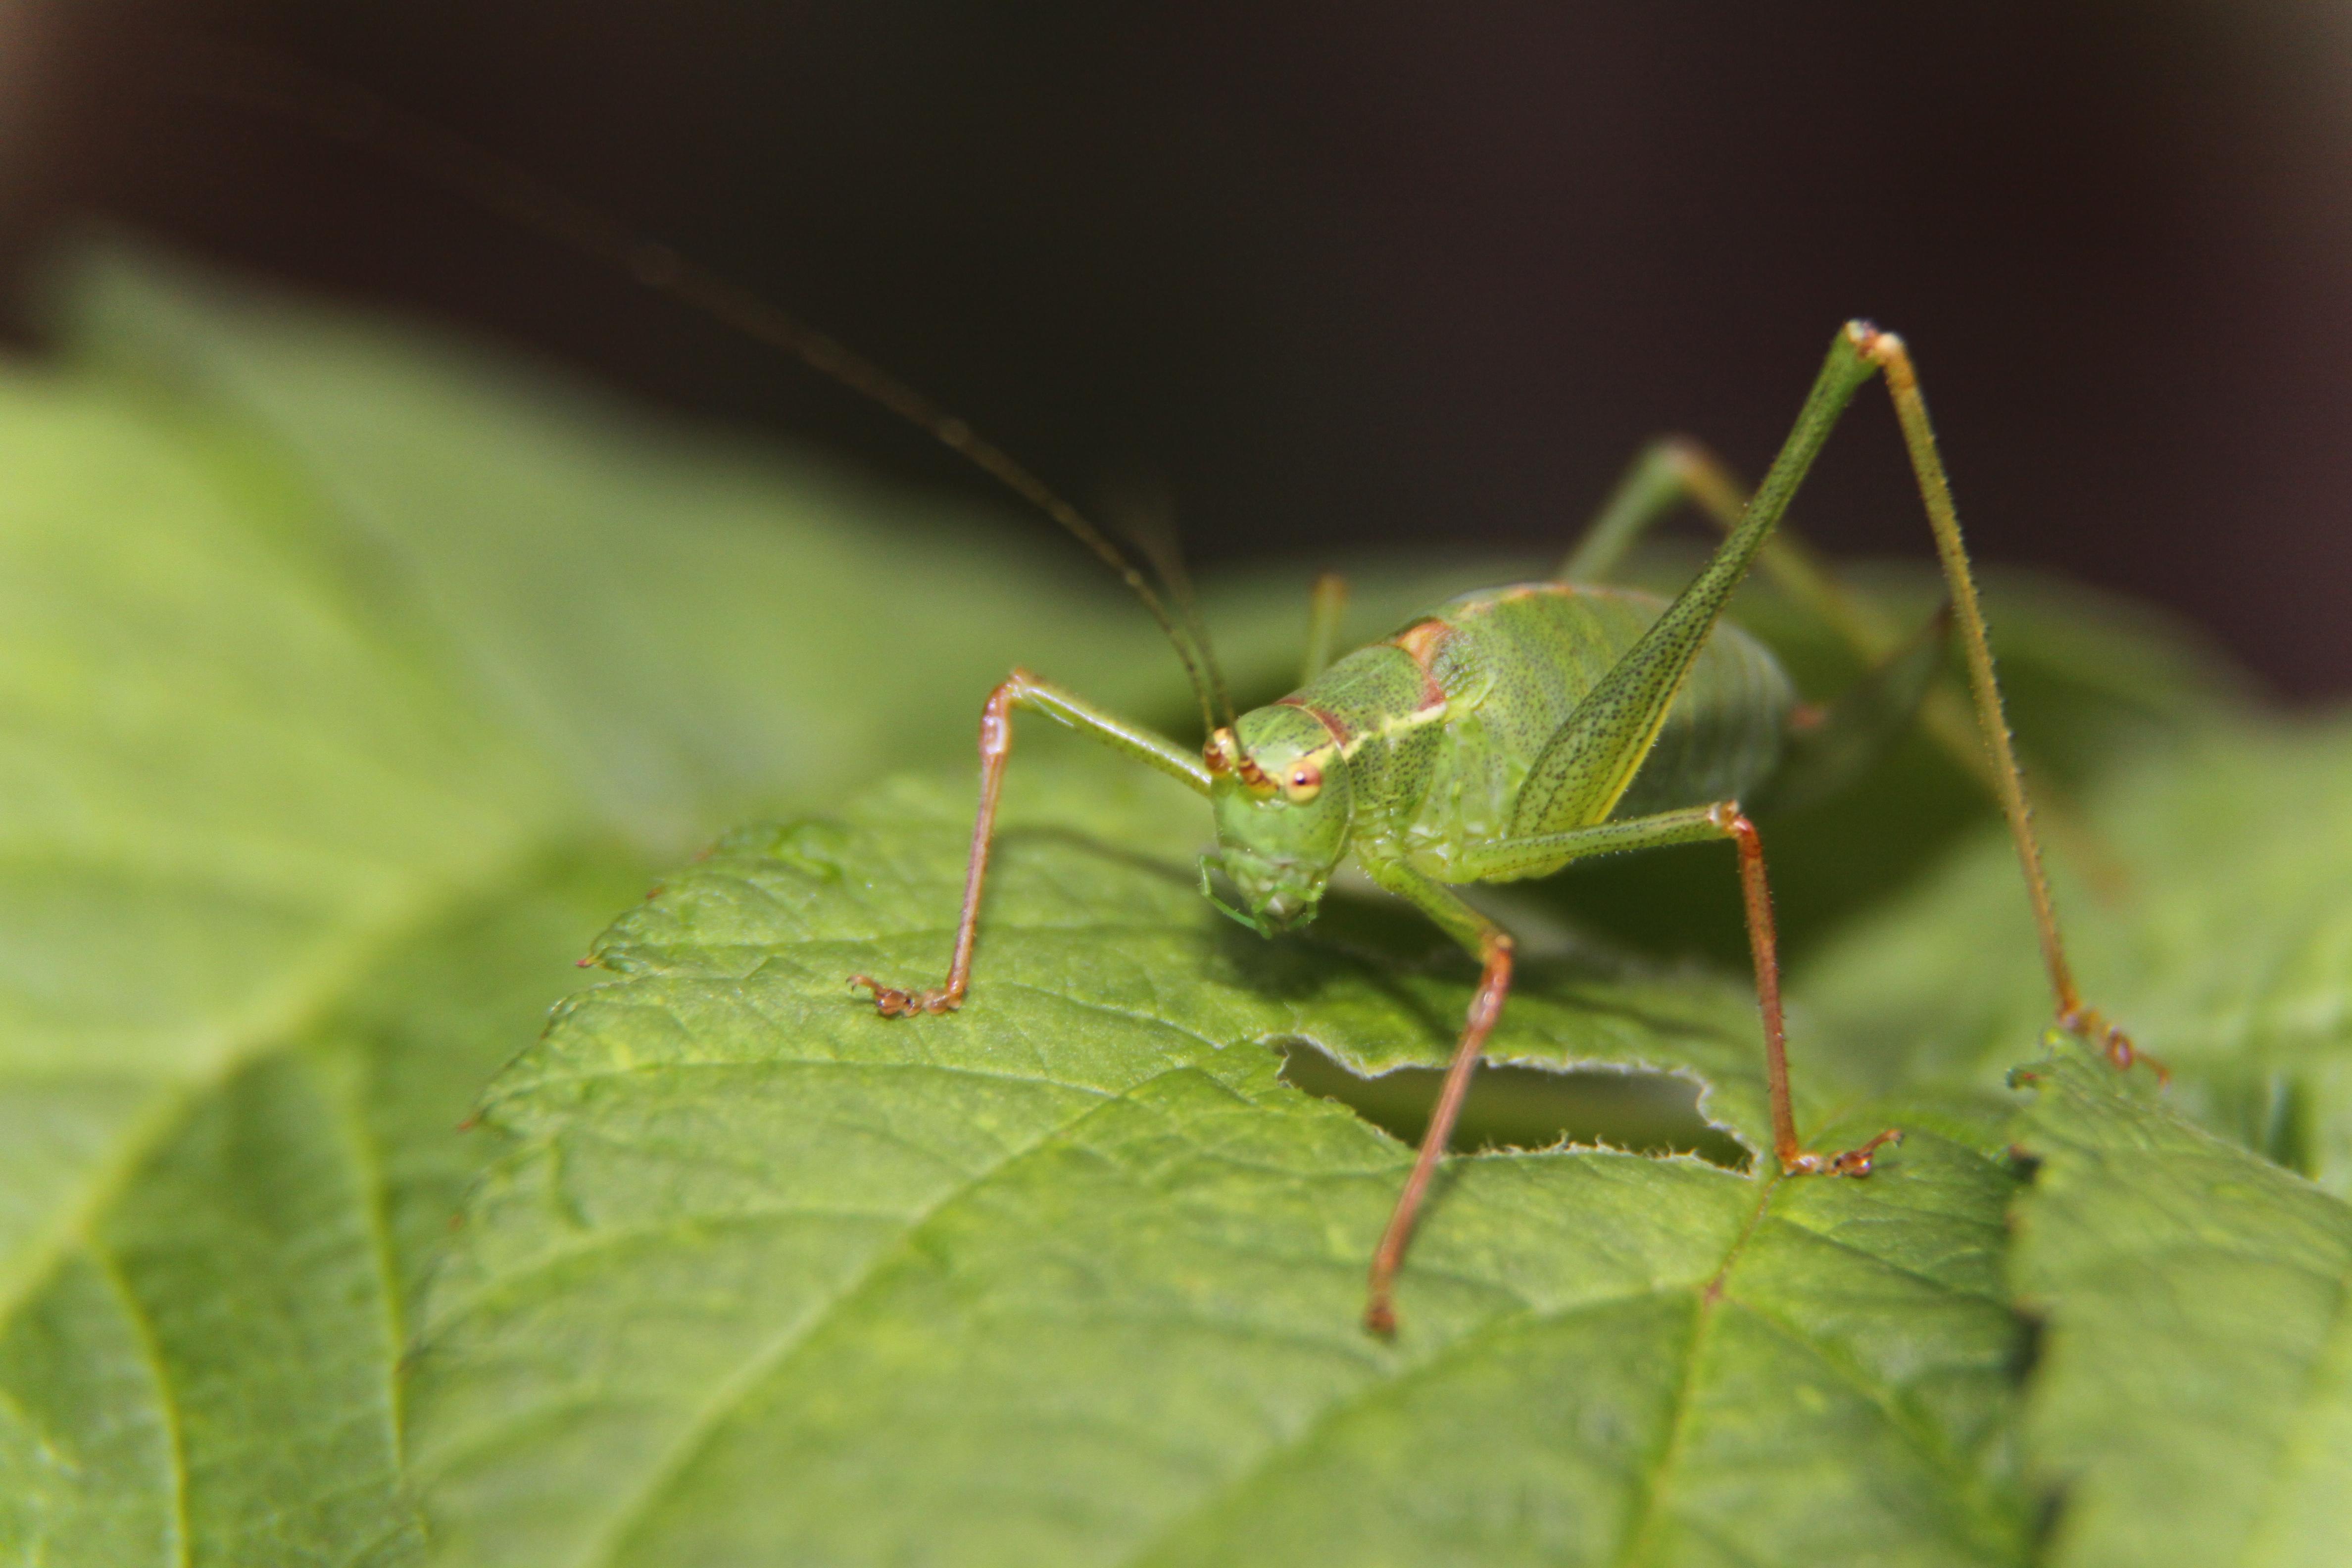 Green Grasshopper on Green Leaf · Free Stock Photo